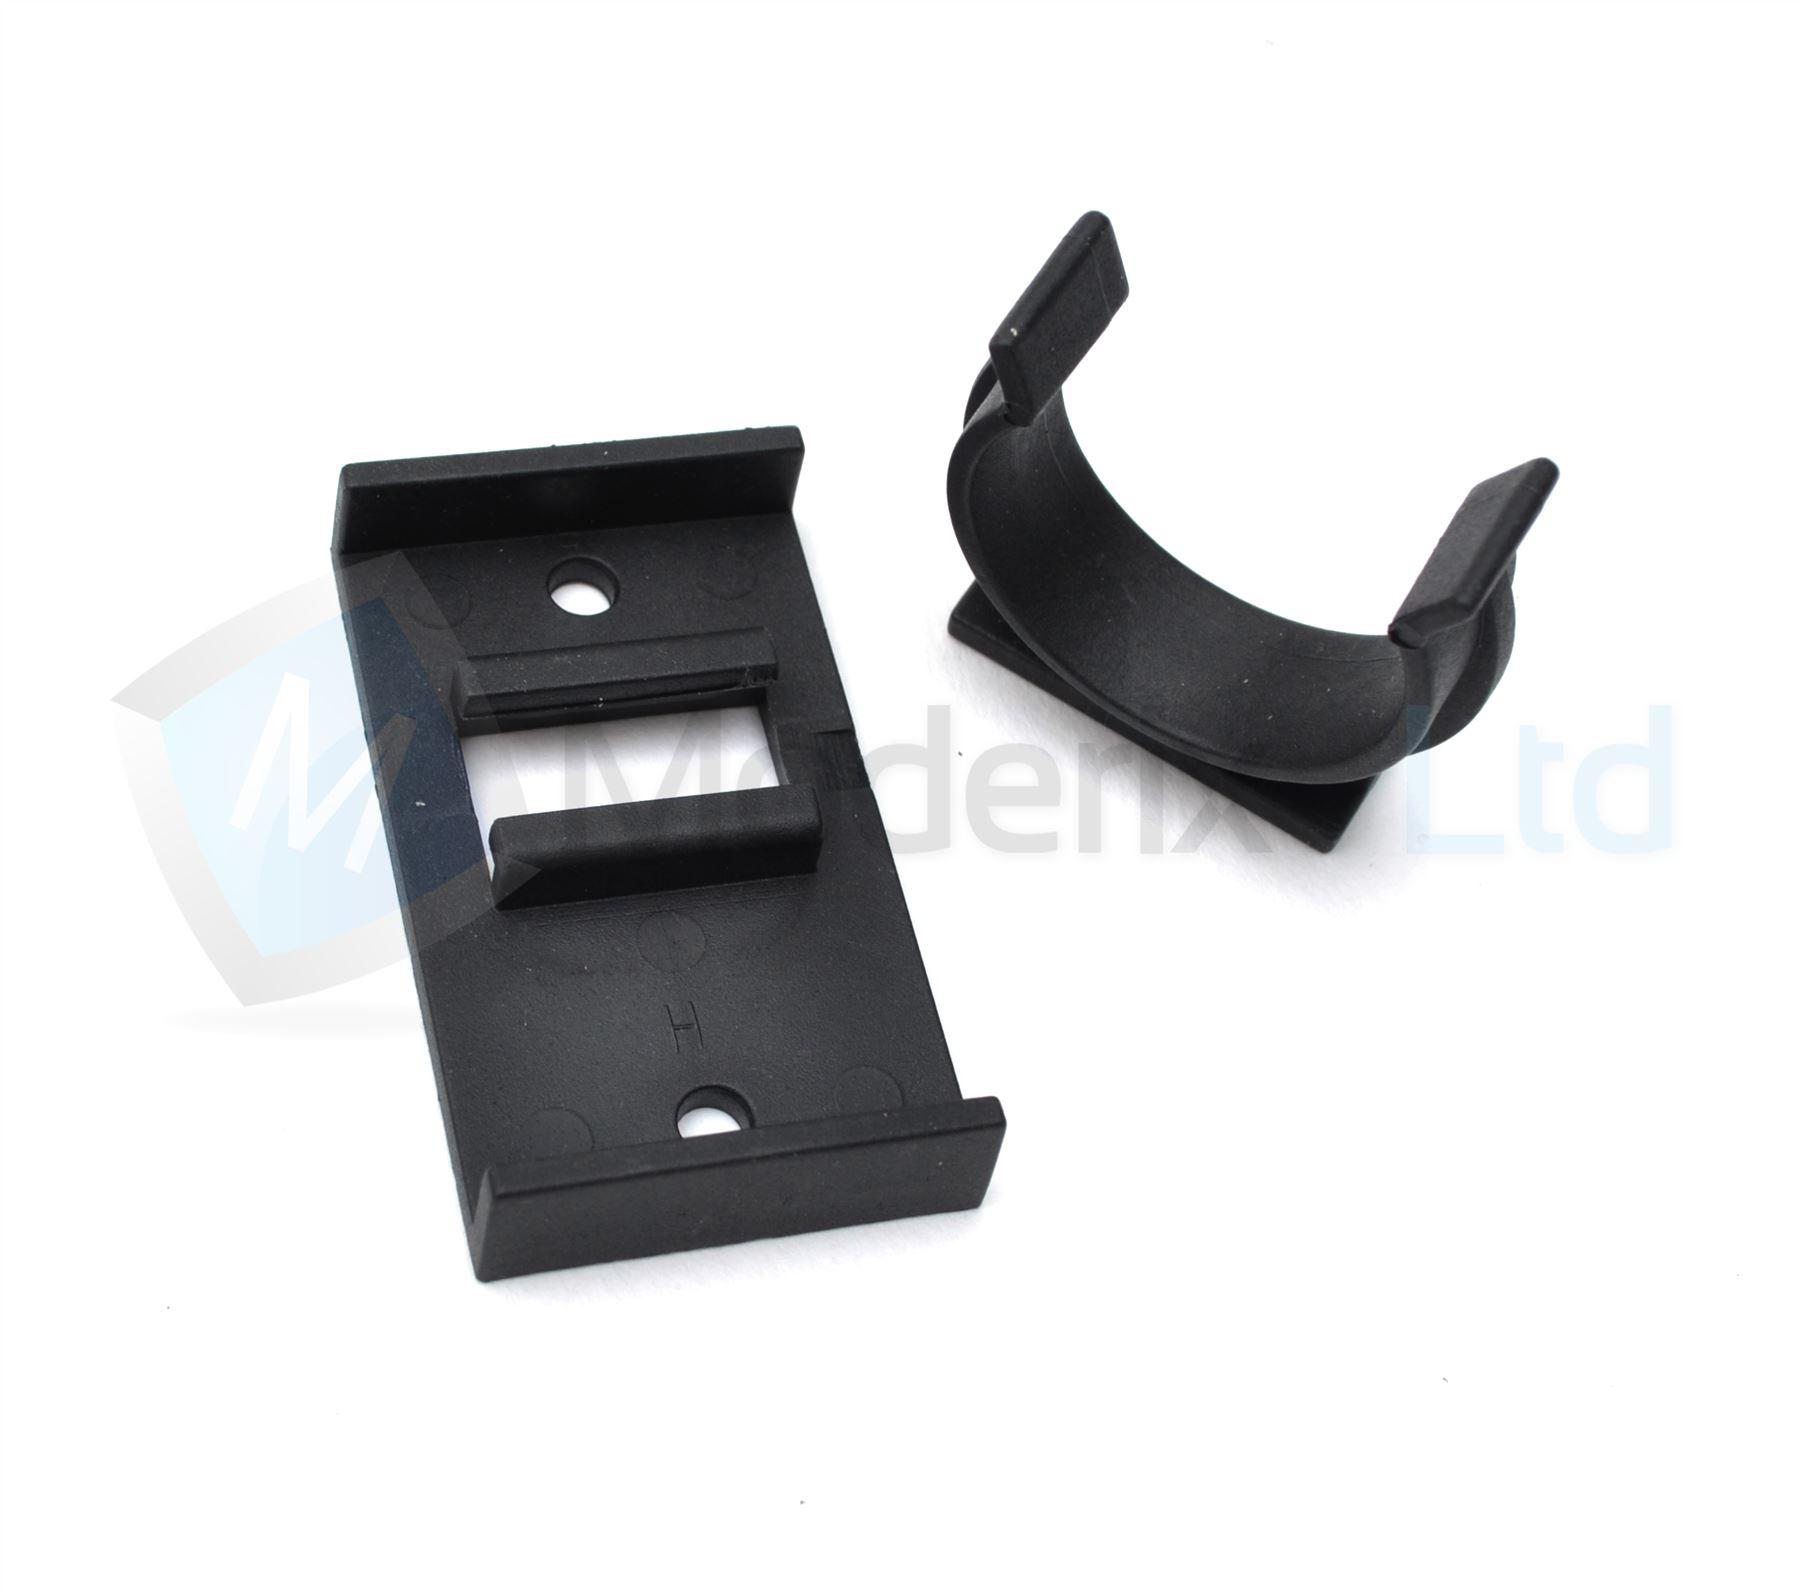 Plastic Clip For Black Legs Sofa Beds Cupboard Cabinets Kitchen Furniture 1pcs Ebay